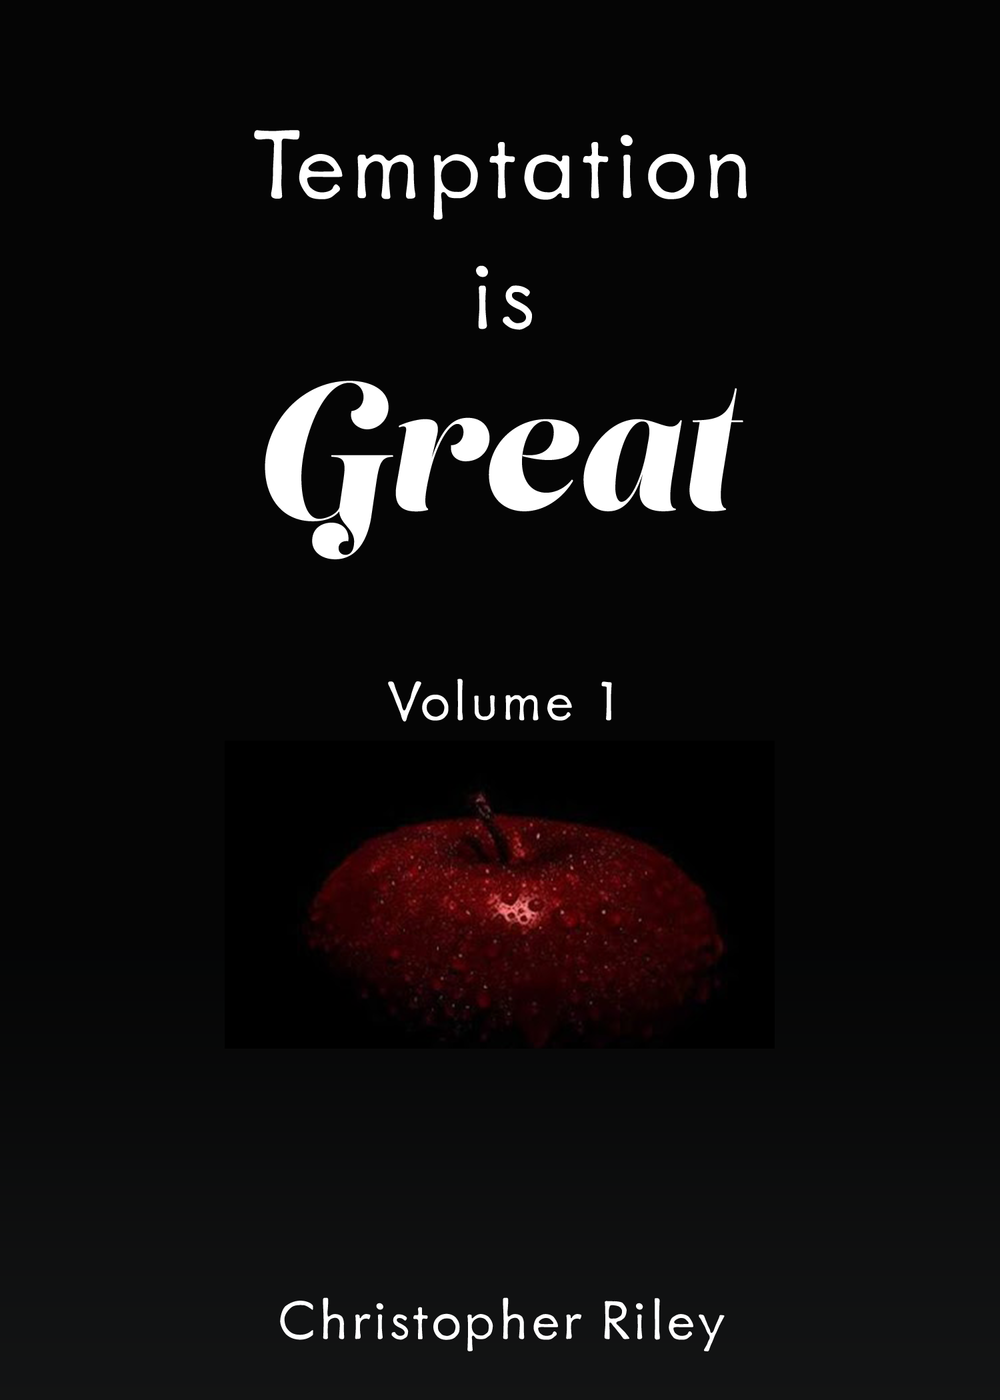 Temptation is Great: Volume 1